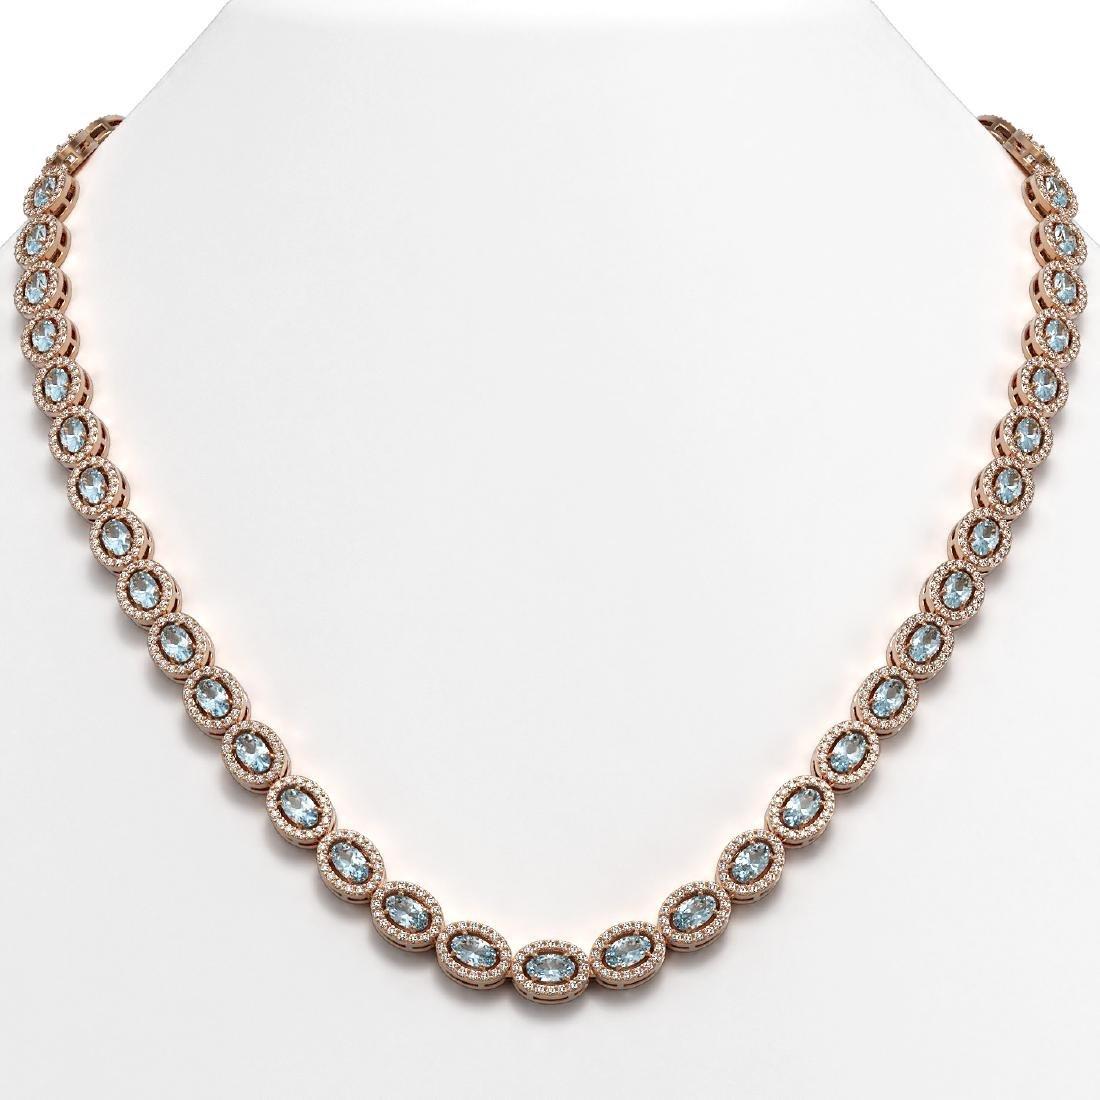 20.71 CTW Aquamarine & Diamond Halo Necklace 10K Rose